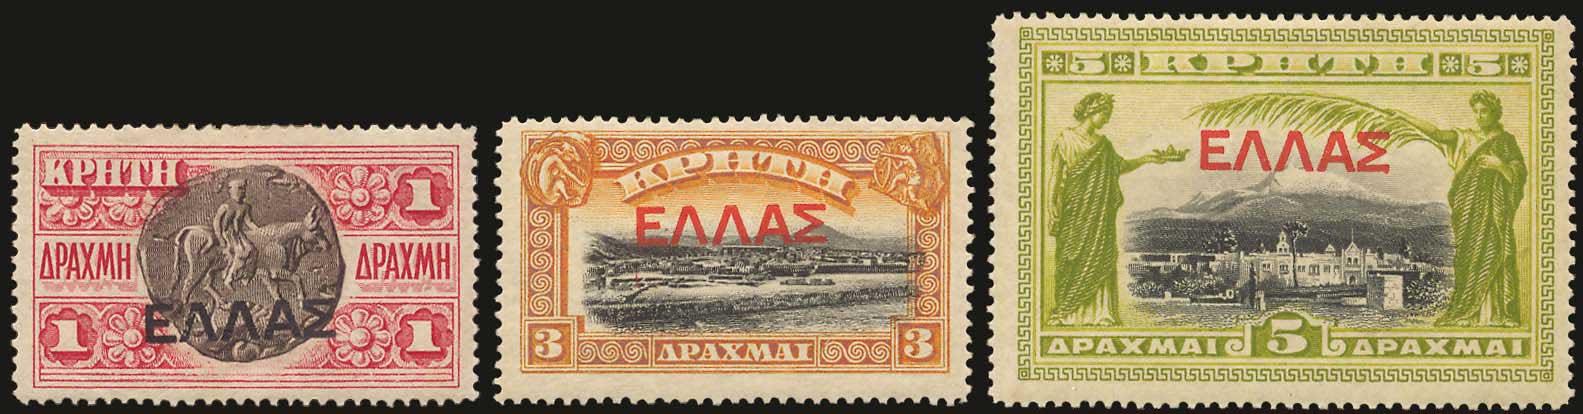 Lot 753 - -  CRETE GREEK & CRETAN POST-OFFICES -  A. Karamitsos Postal & Live Internet Auction 681 General Philatelic Auction